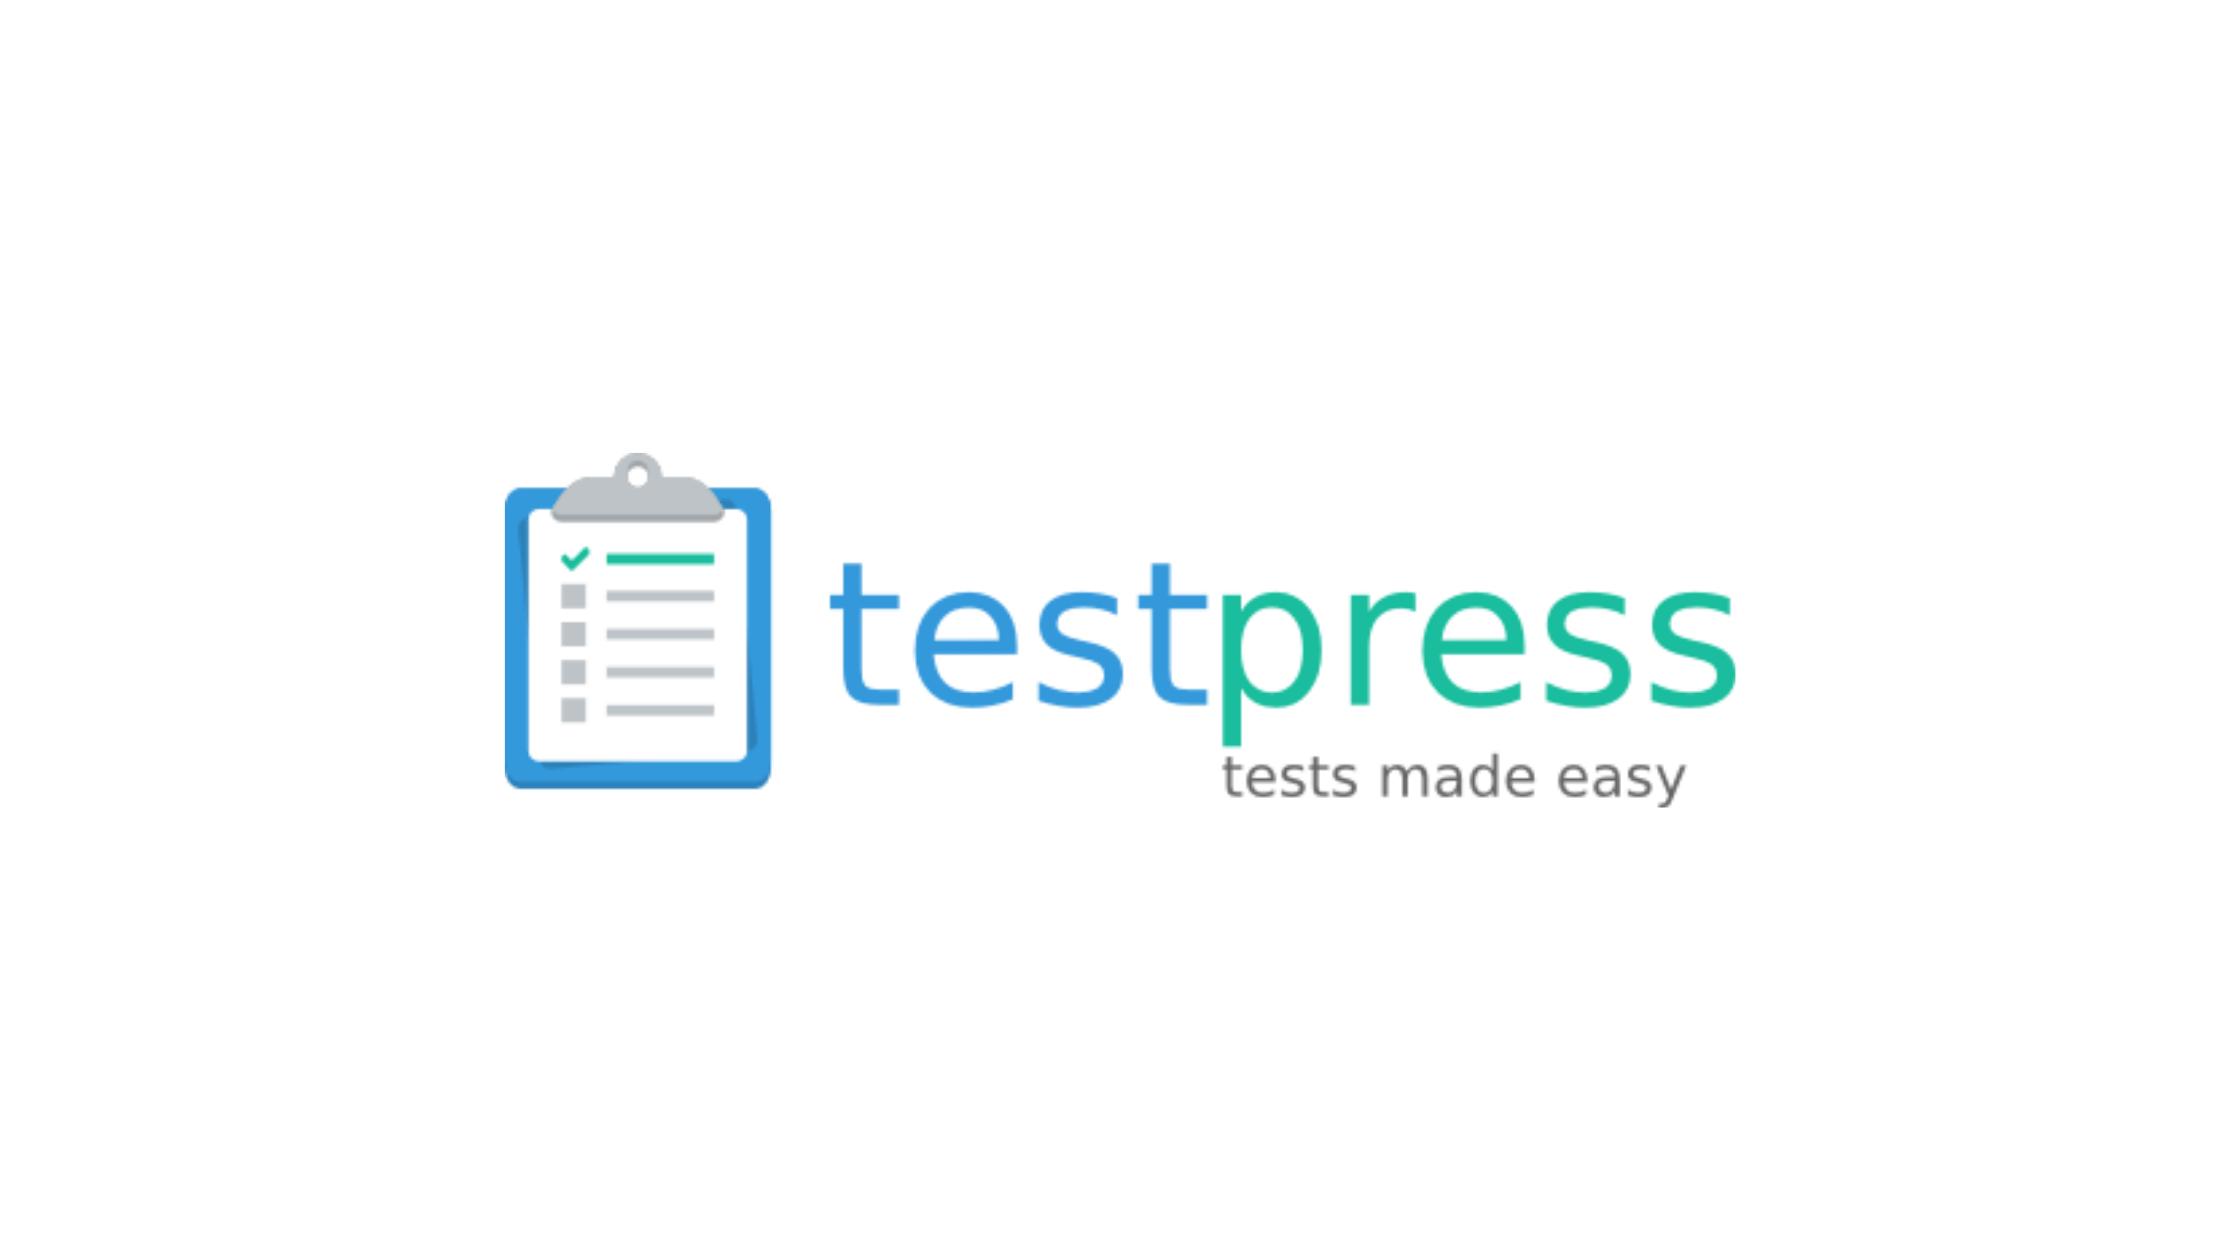 Why Testpress?